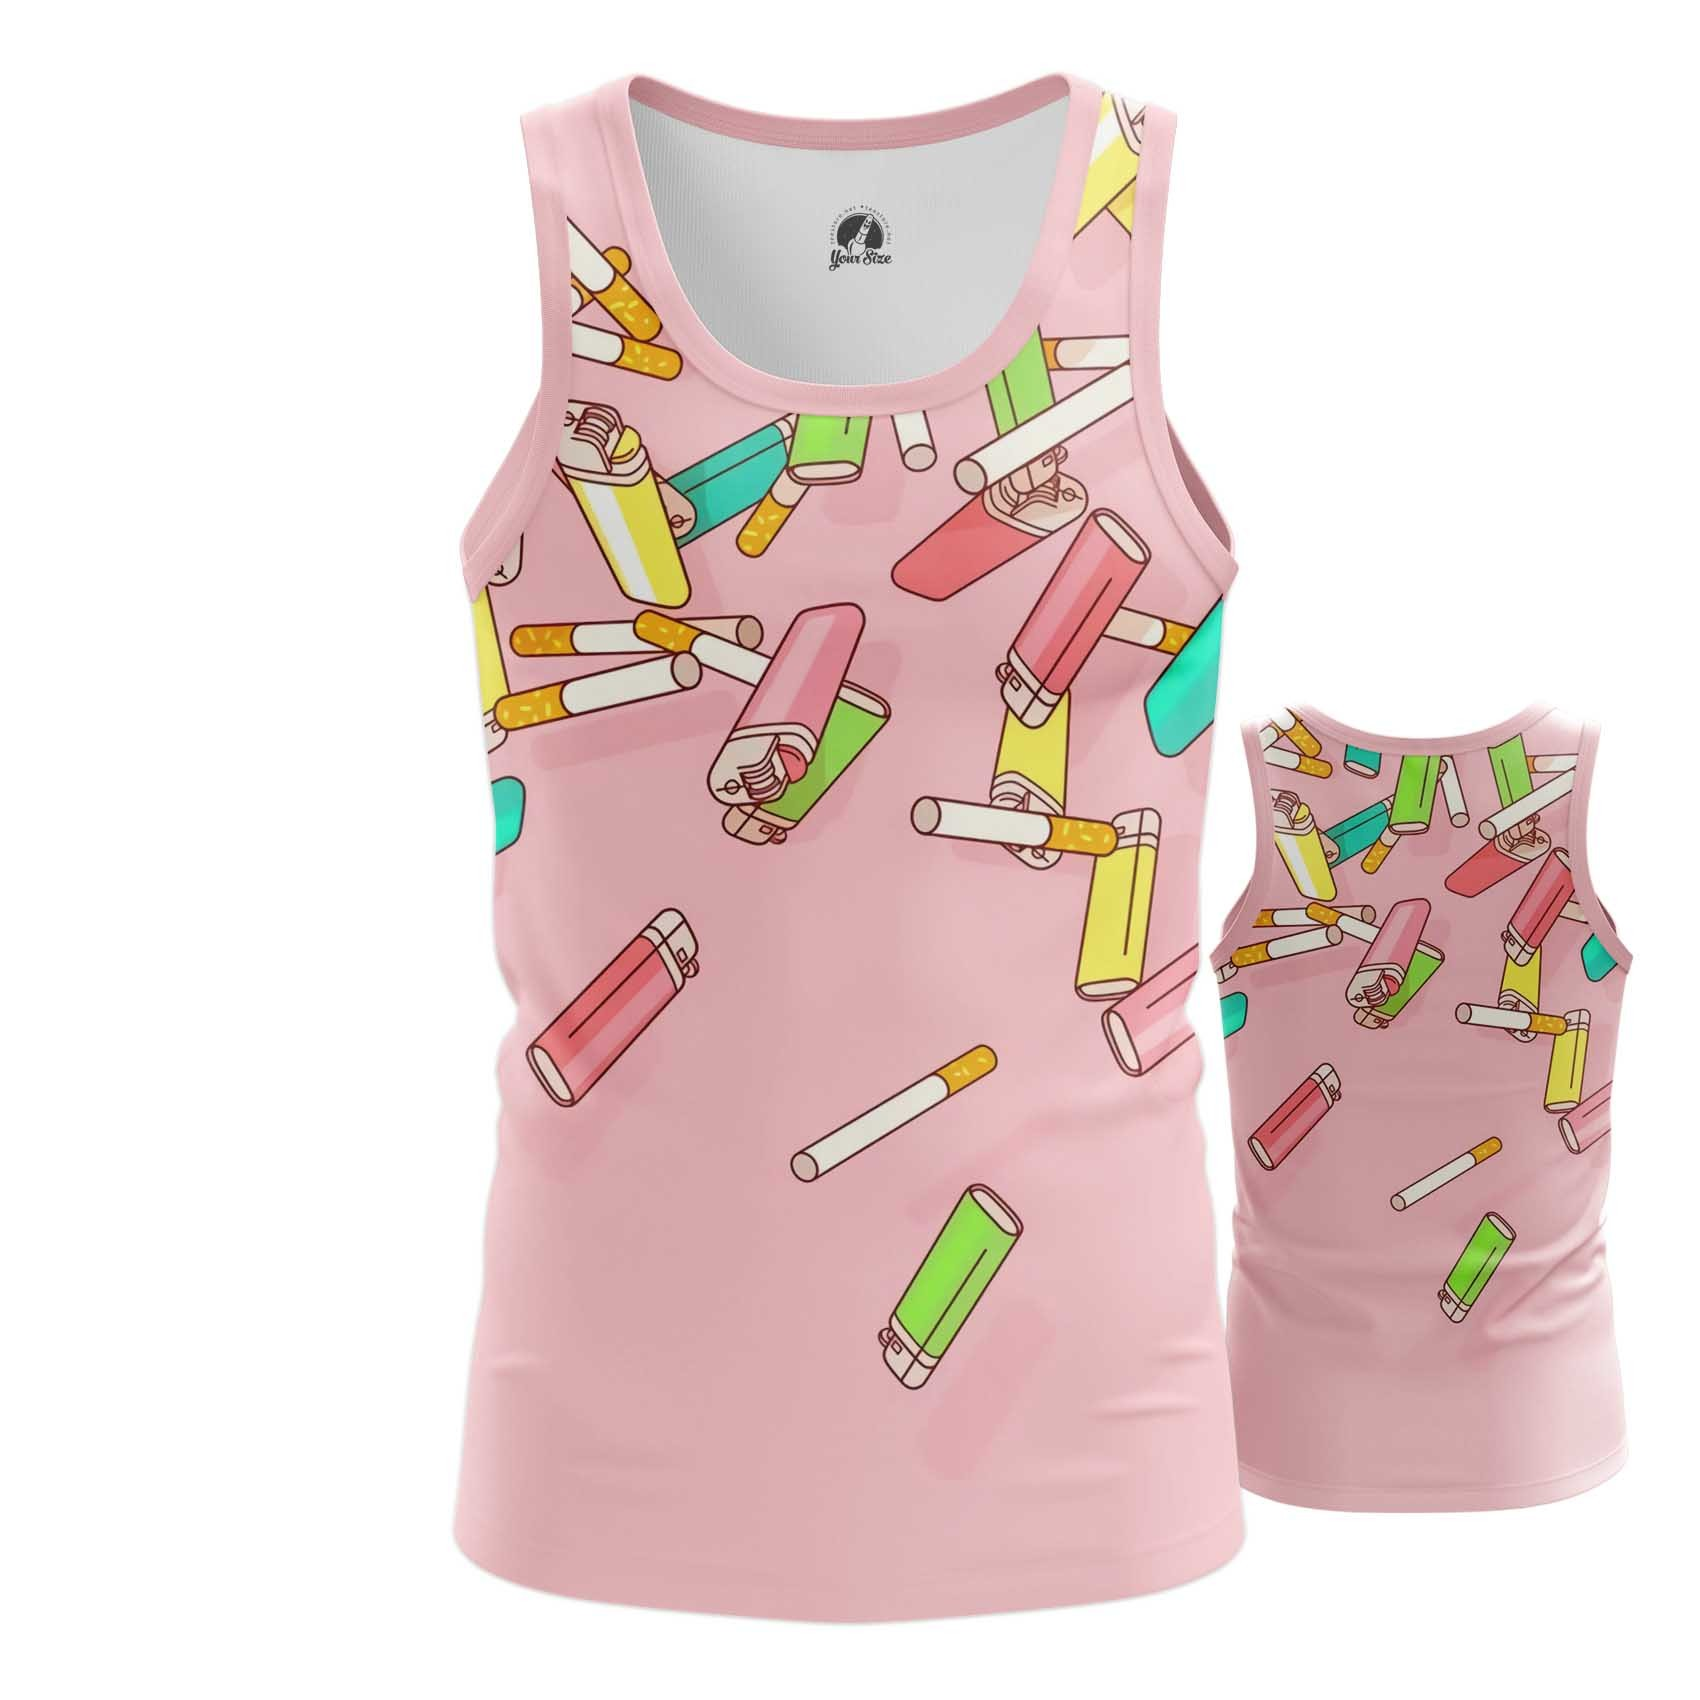 Merchandise Long Sleeve Cigarettes Lighter Pop Art Inspired Textures Pattern